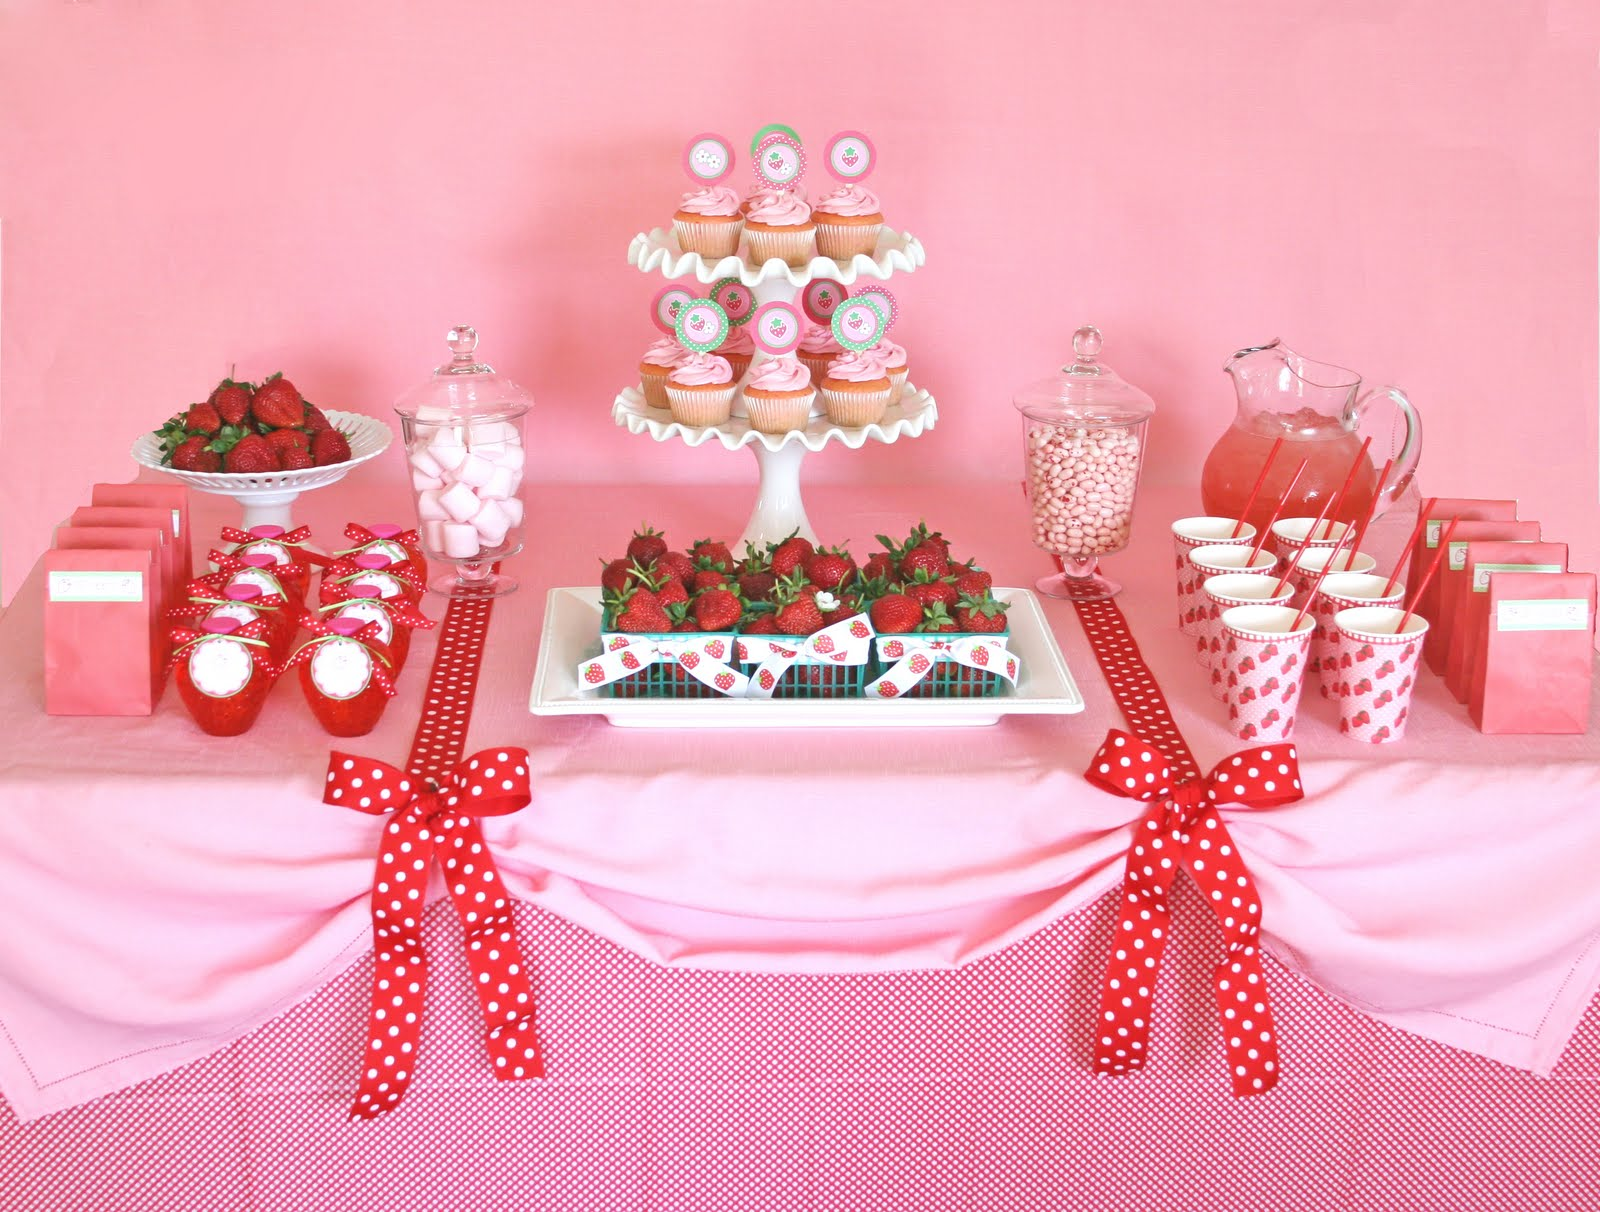 kara s party ideas sweet strawberry party kara s party ideas